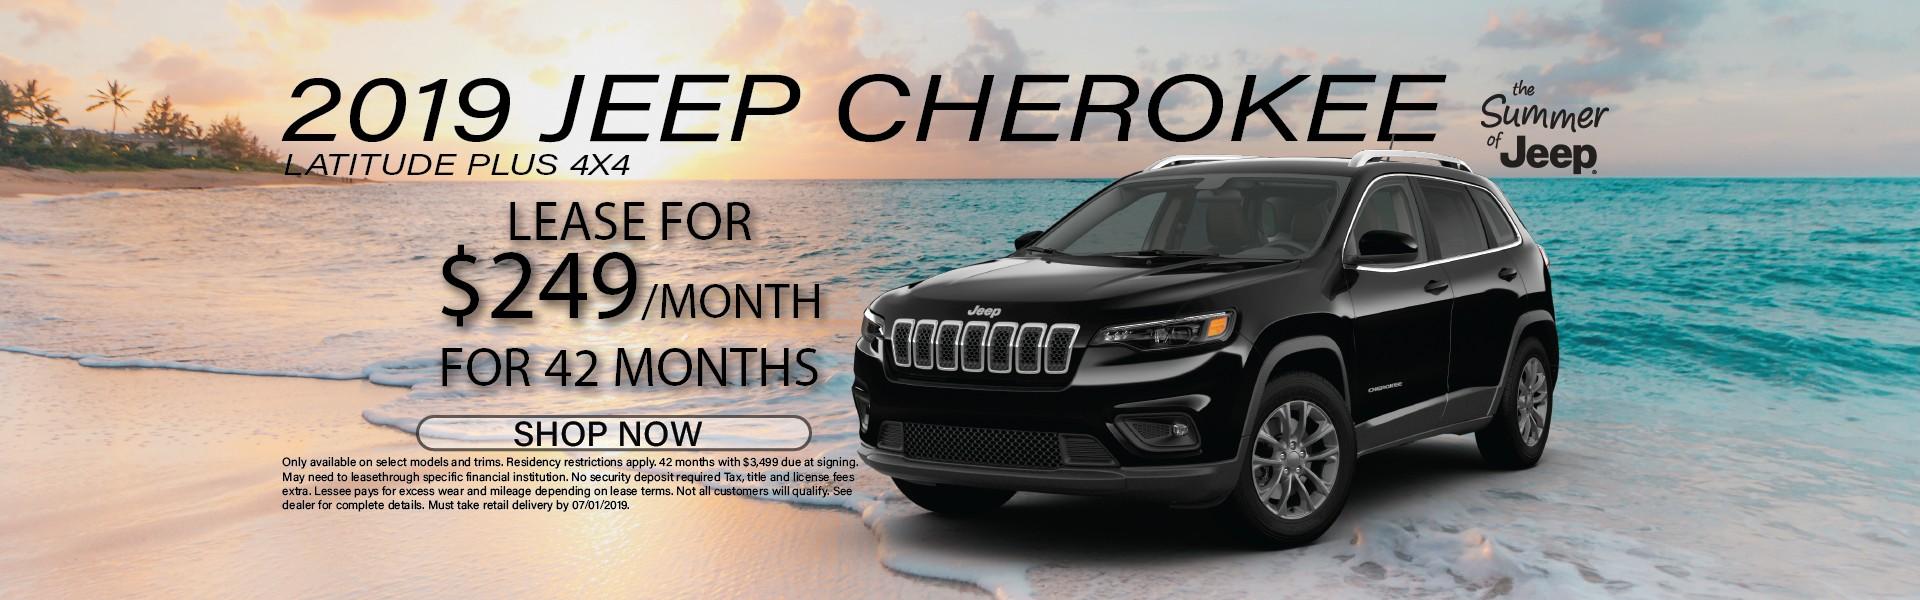 2019 Jeep Cherokee Lat Plus